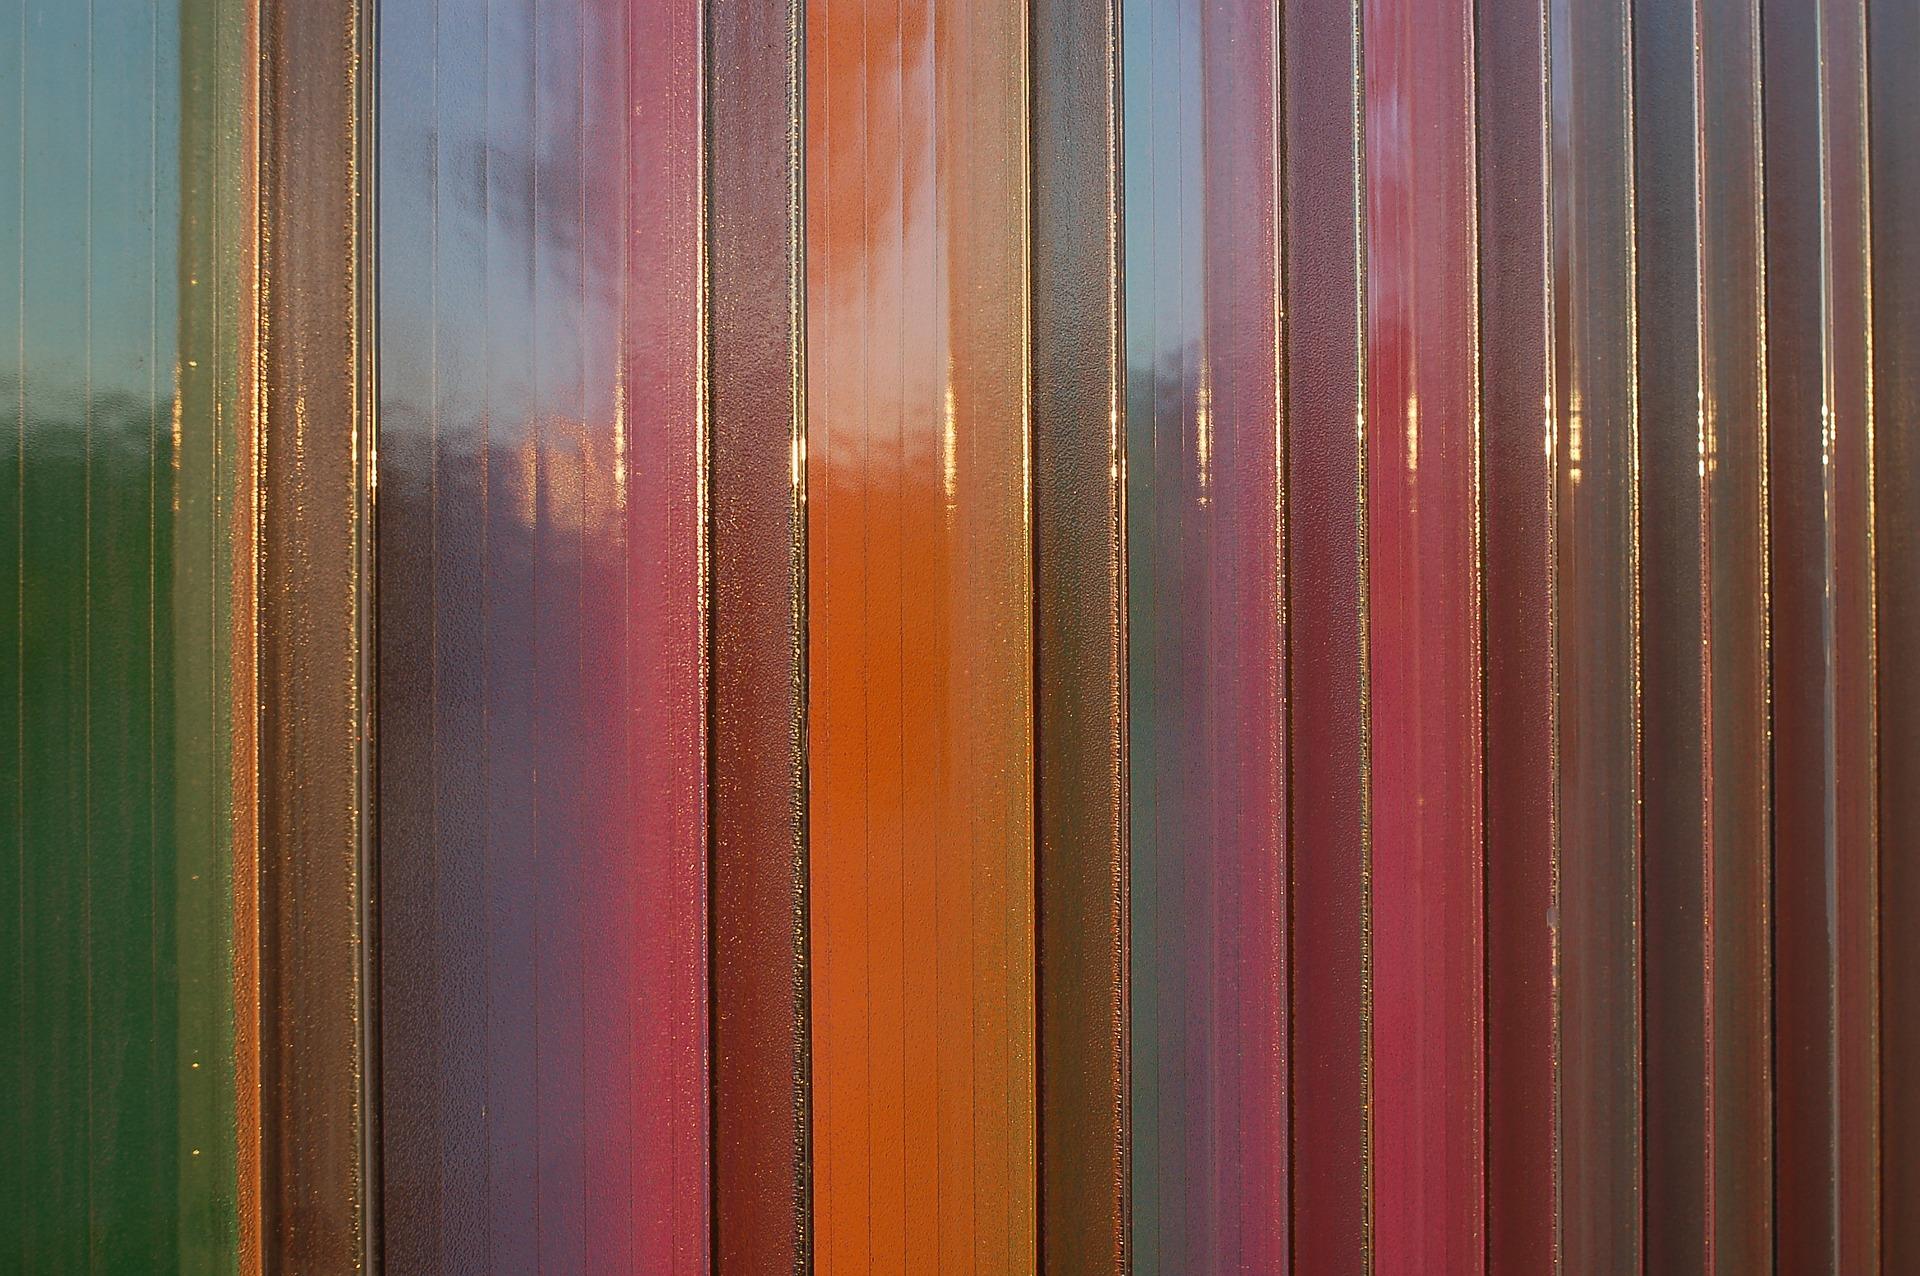 fence-387970_1920